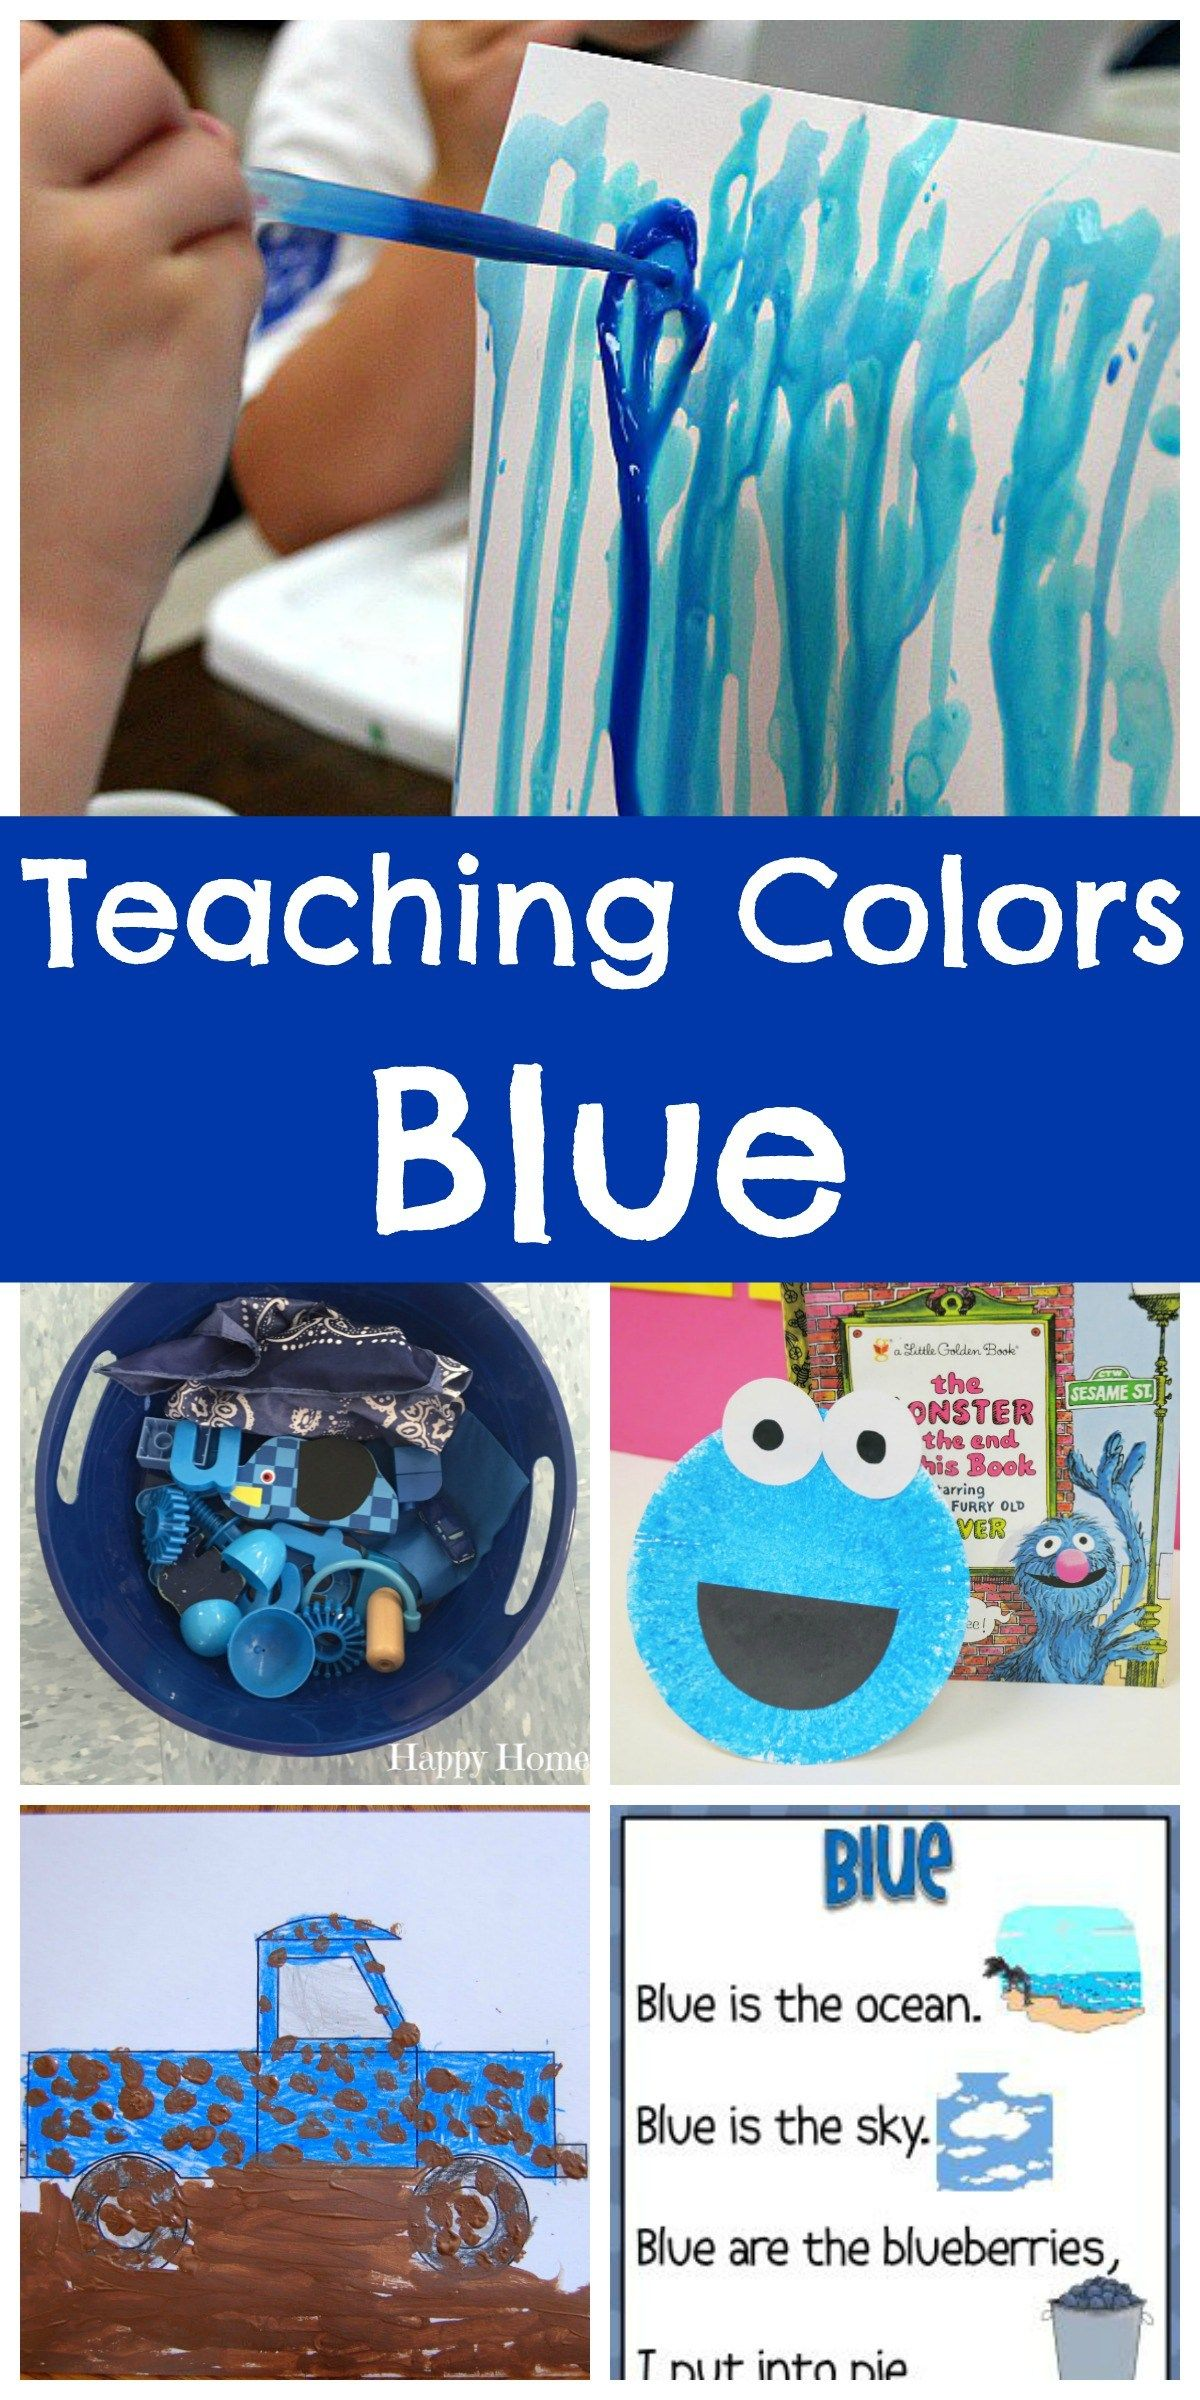 Kinder Garden: Teaching Colors - Blue